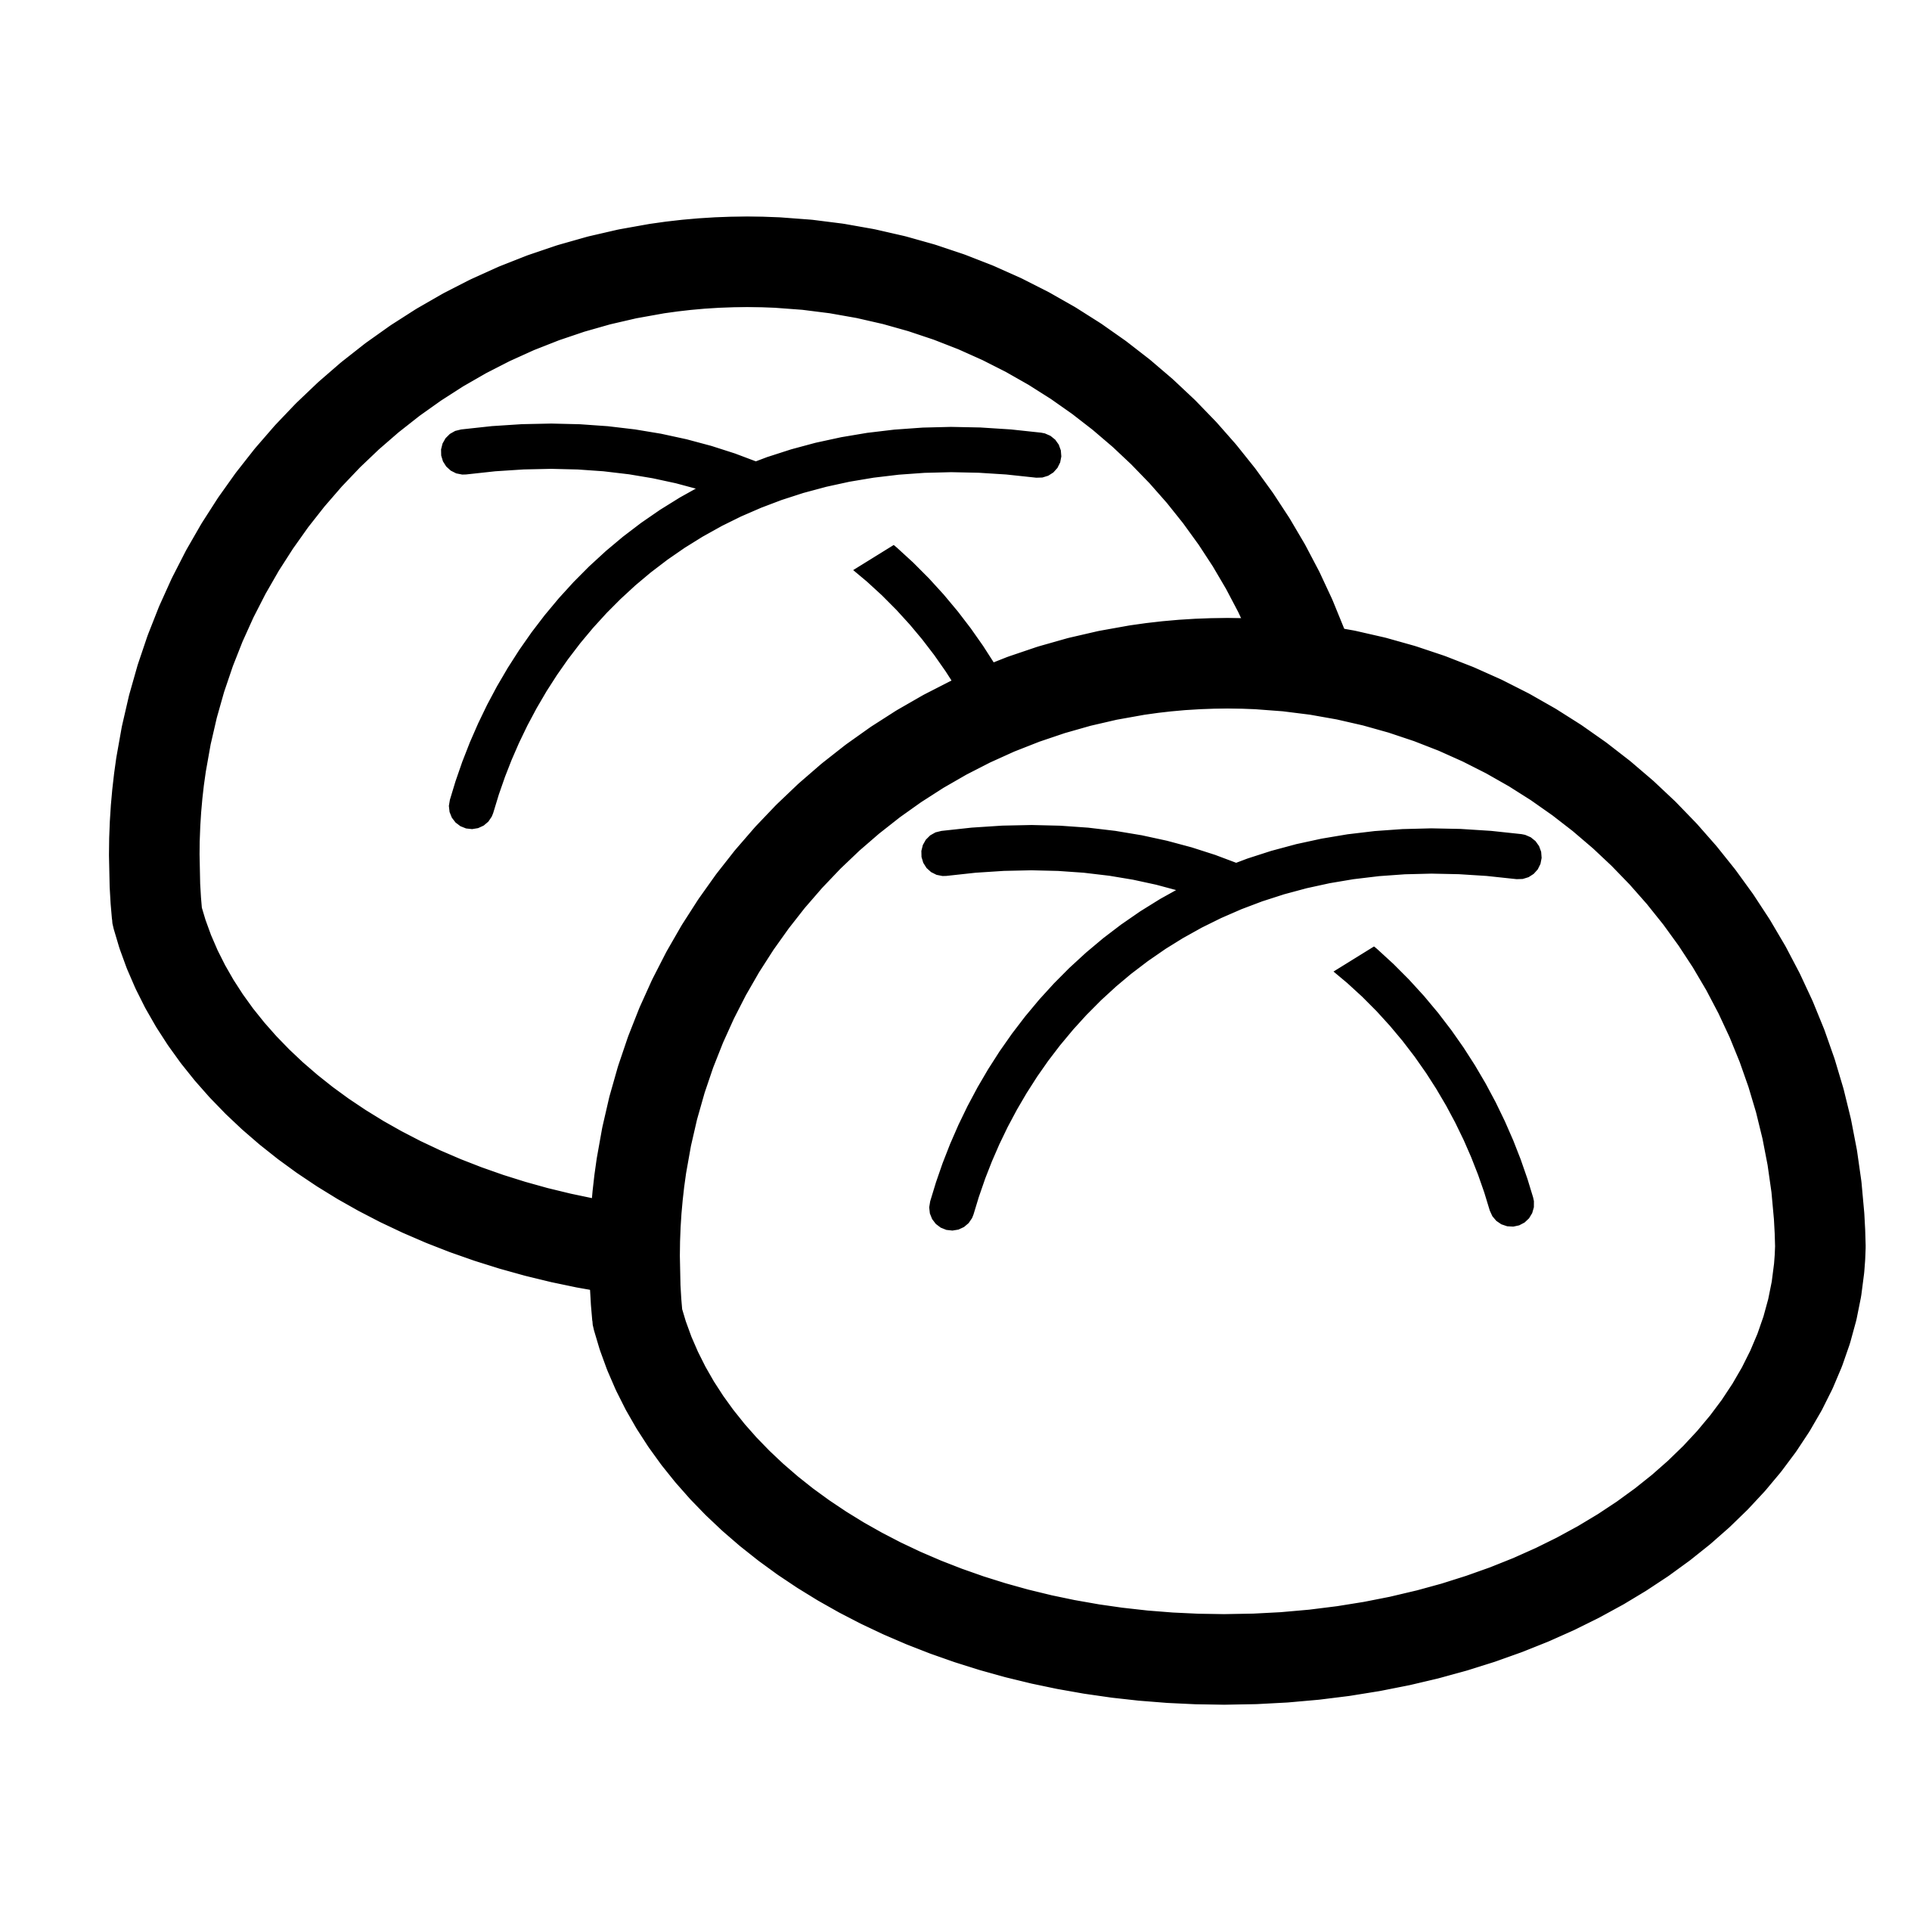 2555x2555 Bakery Symbols Clip Art